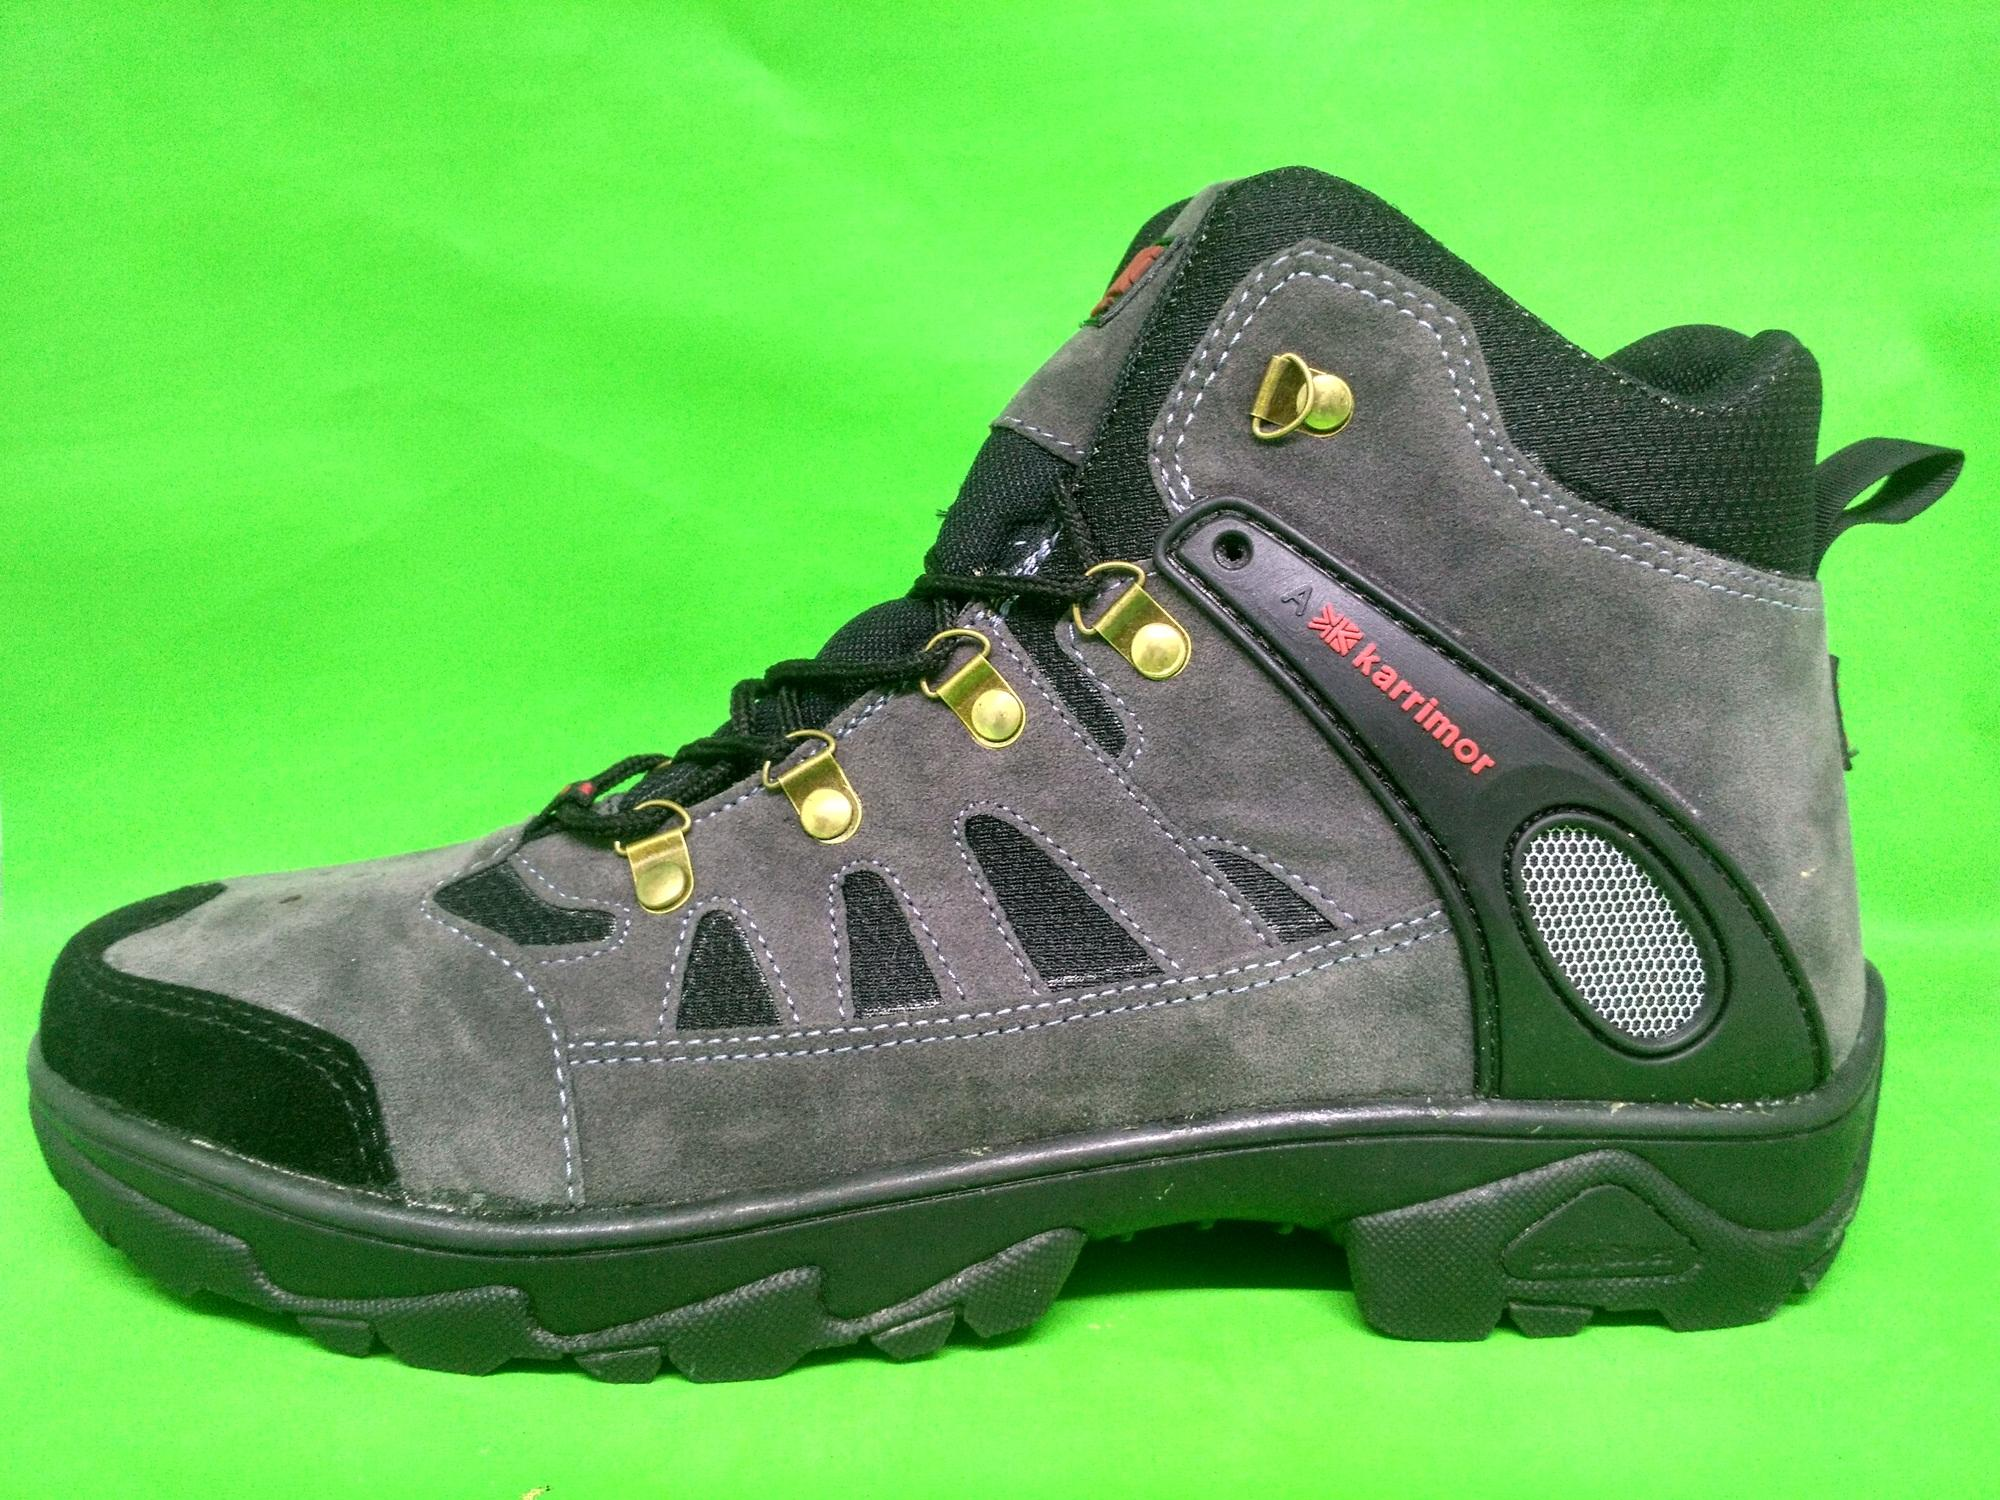 Sepatu Karrimor High. Sepatu Hiking Gunung. Sepatu Tracking Boots Pria Murah bf535ee868